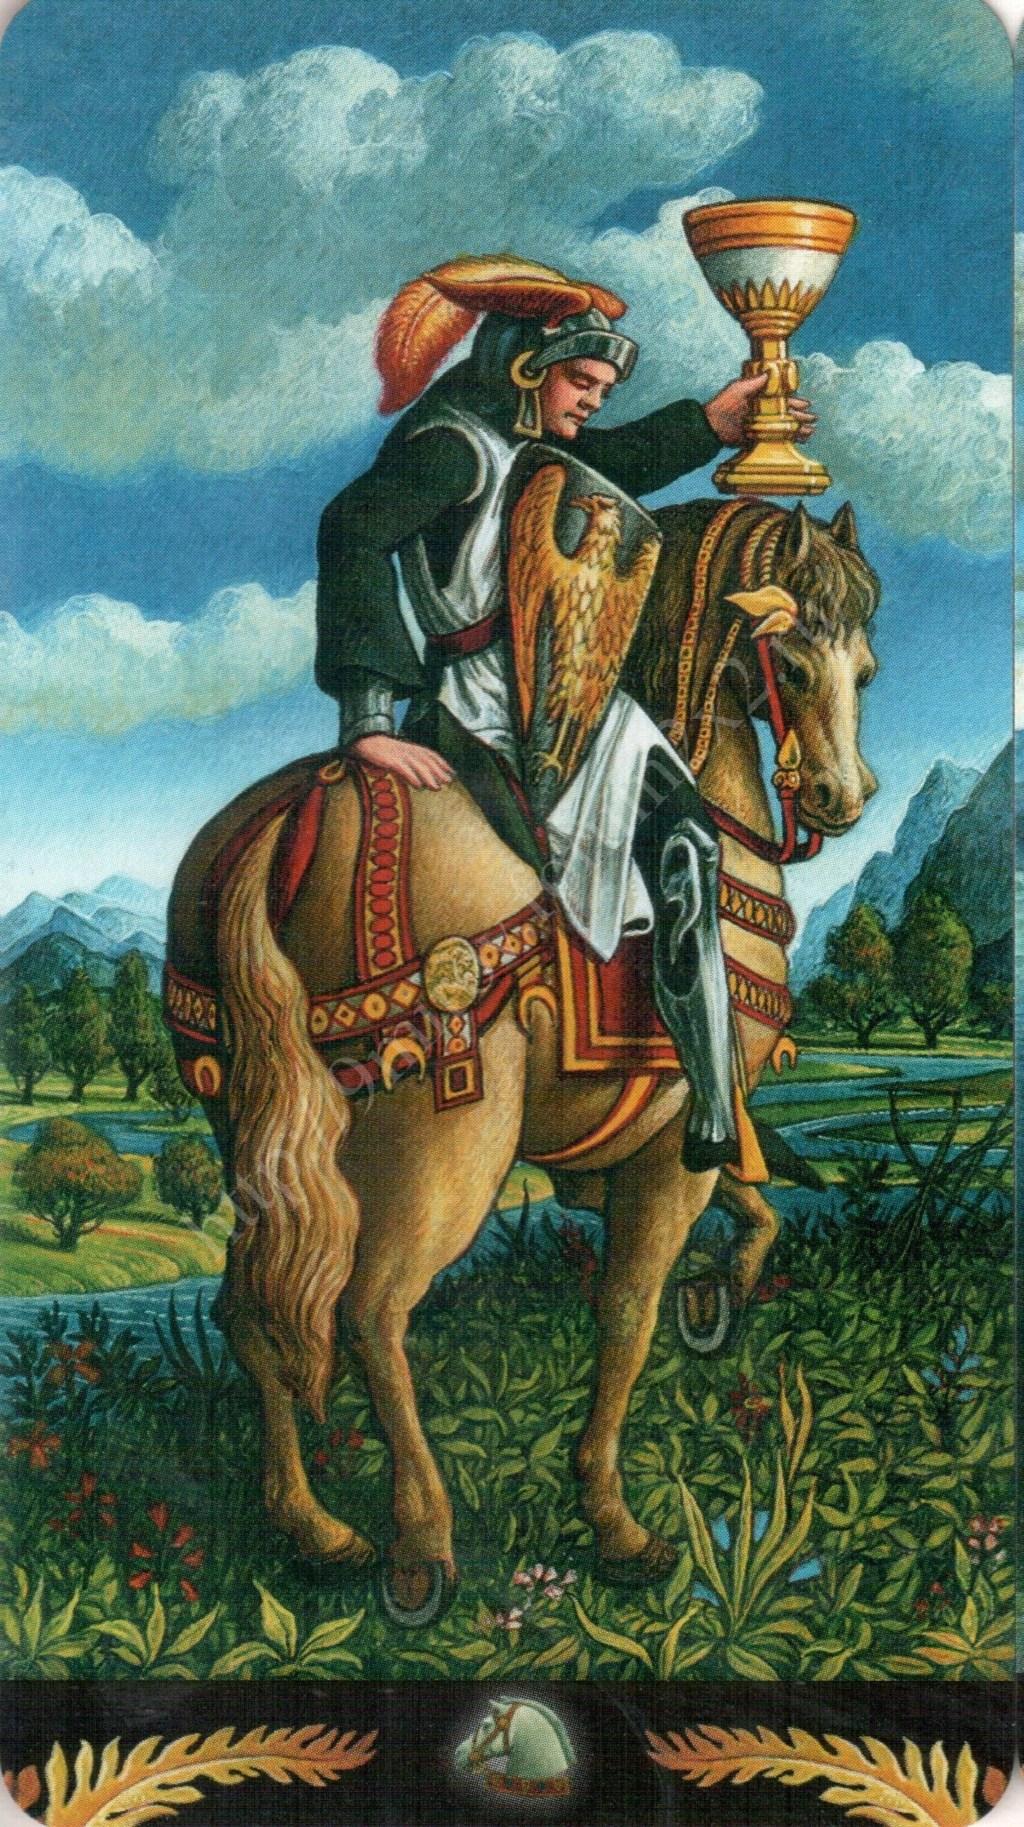 Таро Прерафаэлитов (Pre-Raphaelite Tarot) Галерея Water396